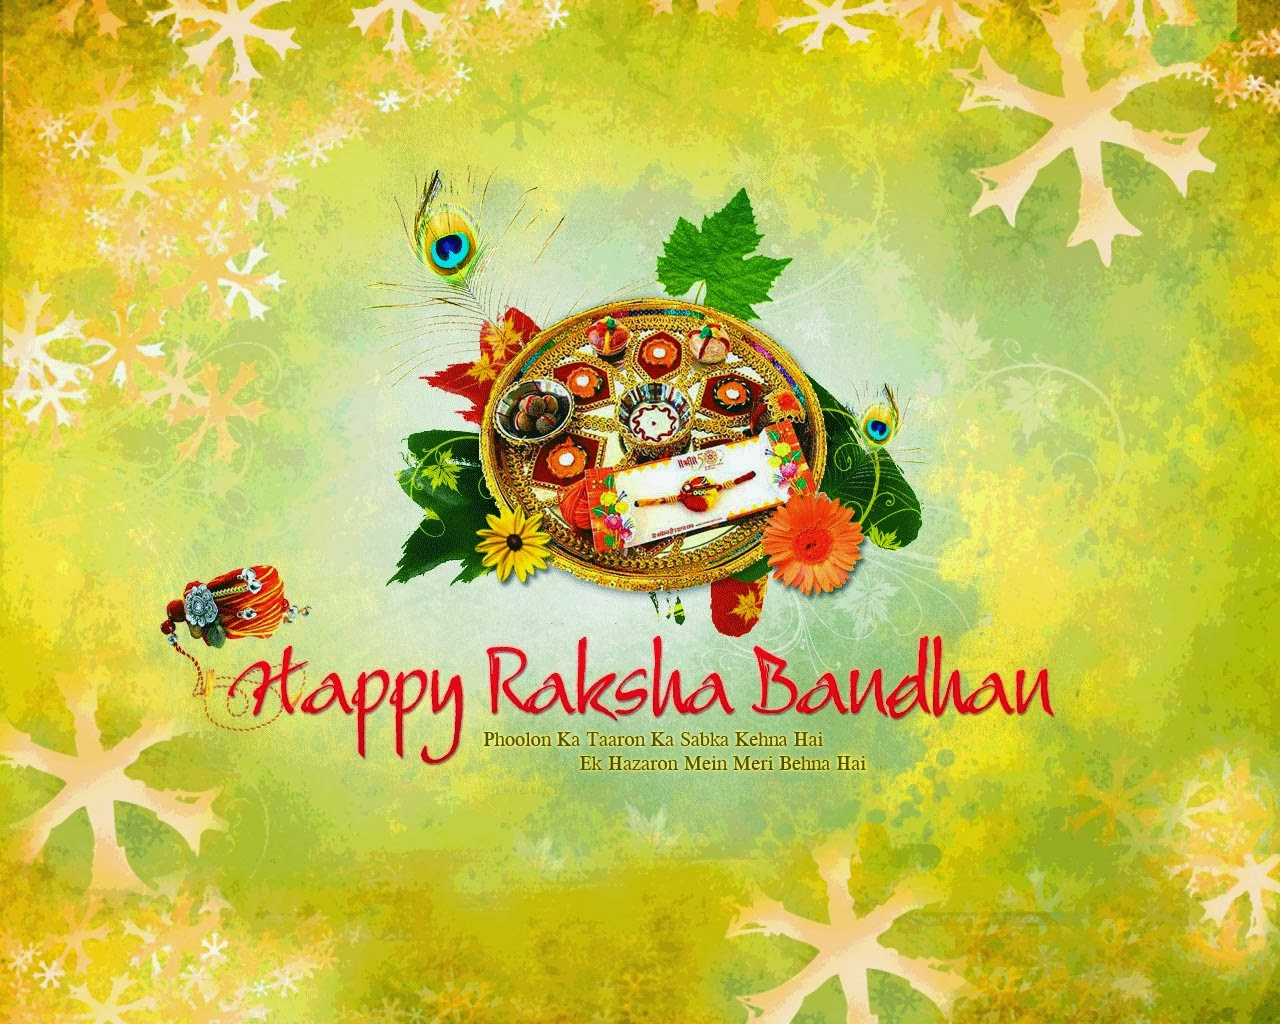 Sai Baba Animated Wallpaper For Mobile Raksha Bandhan Wallpapers Hindu God Wallpaper